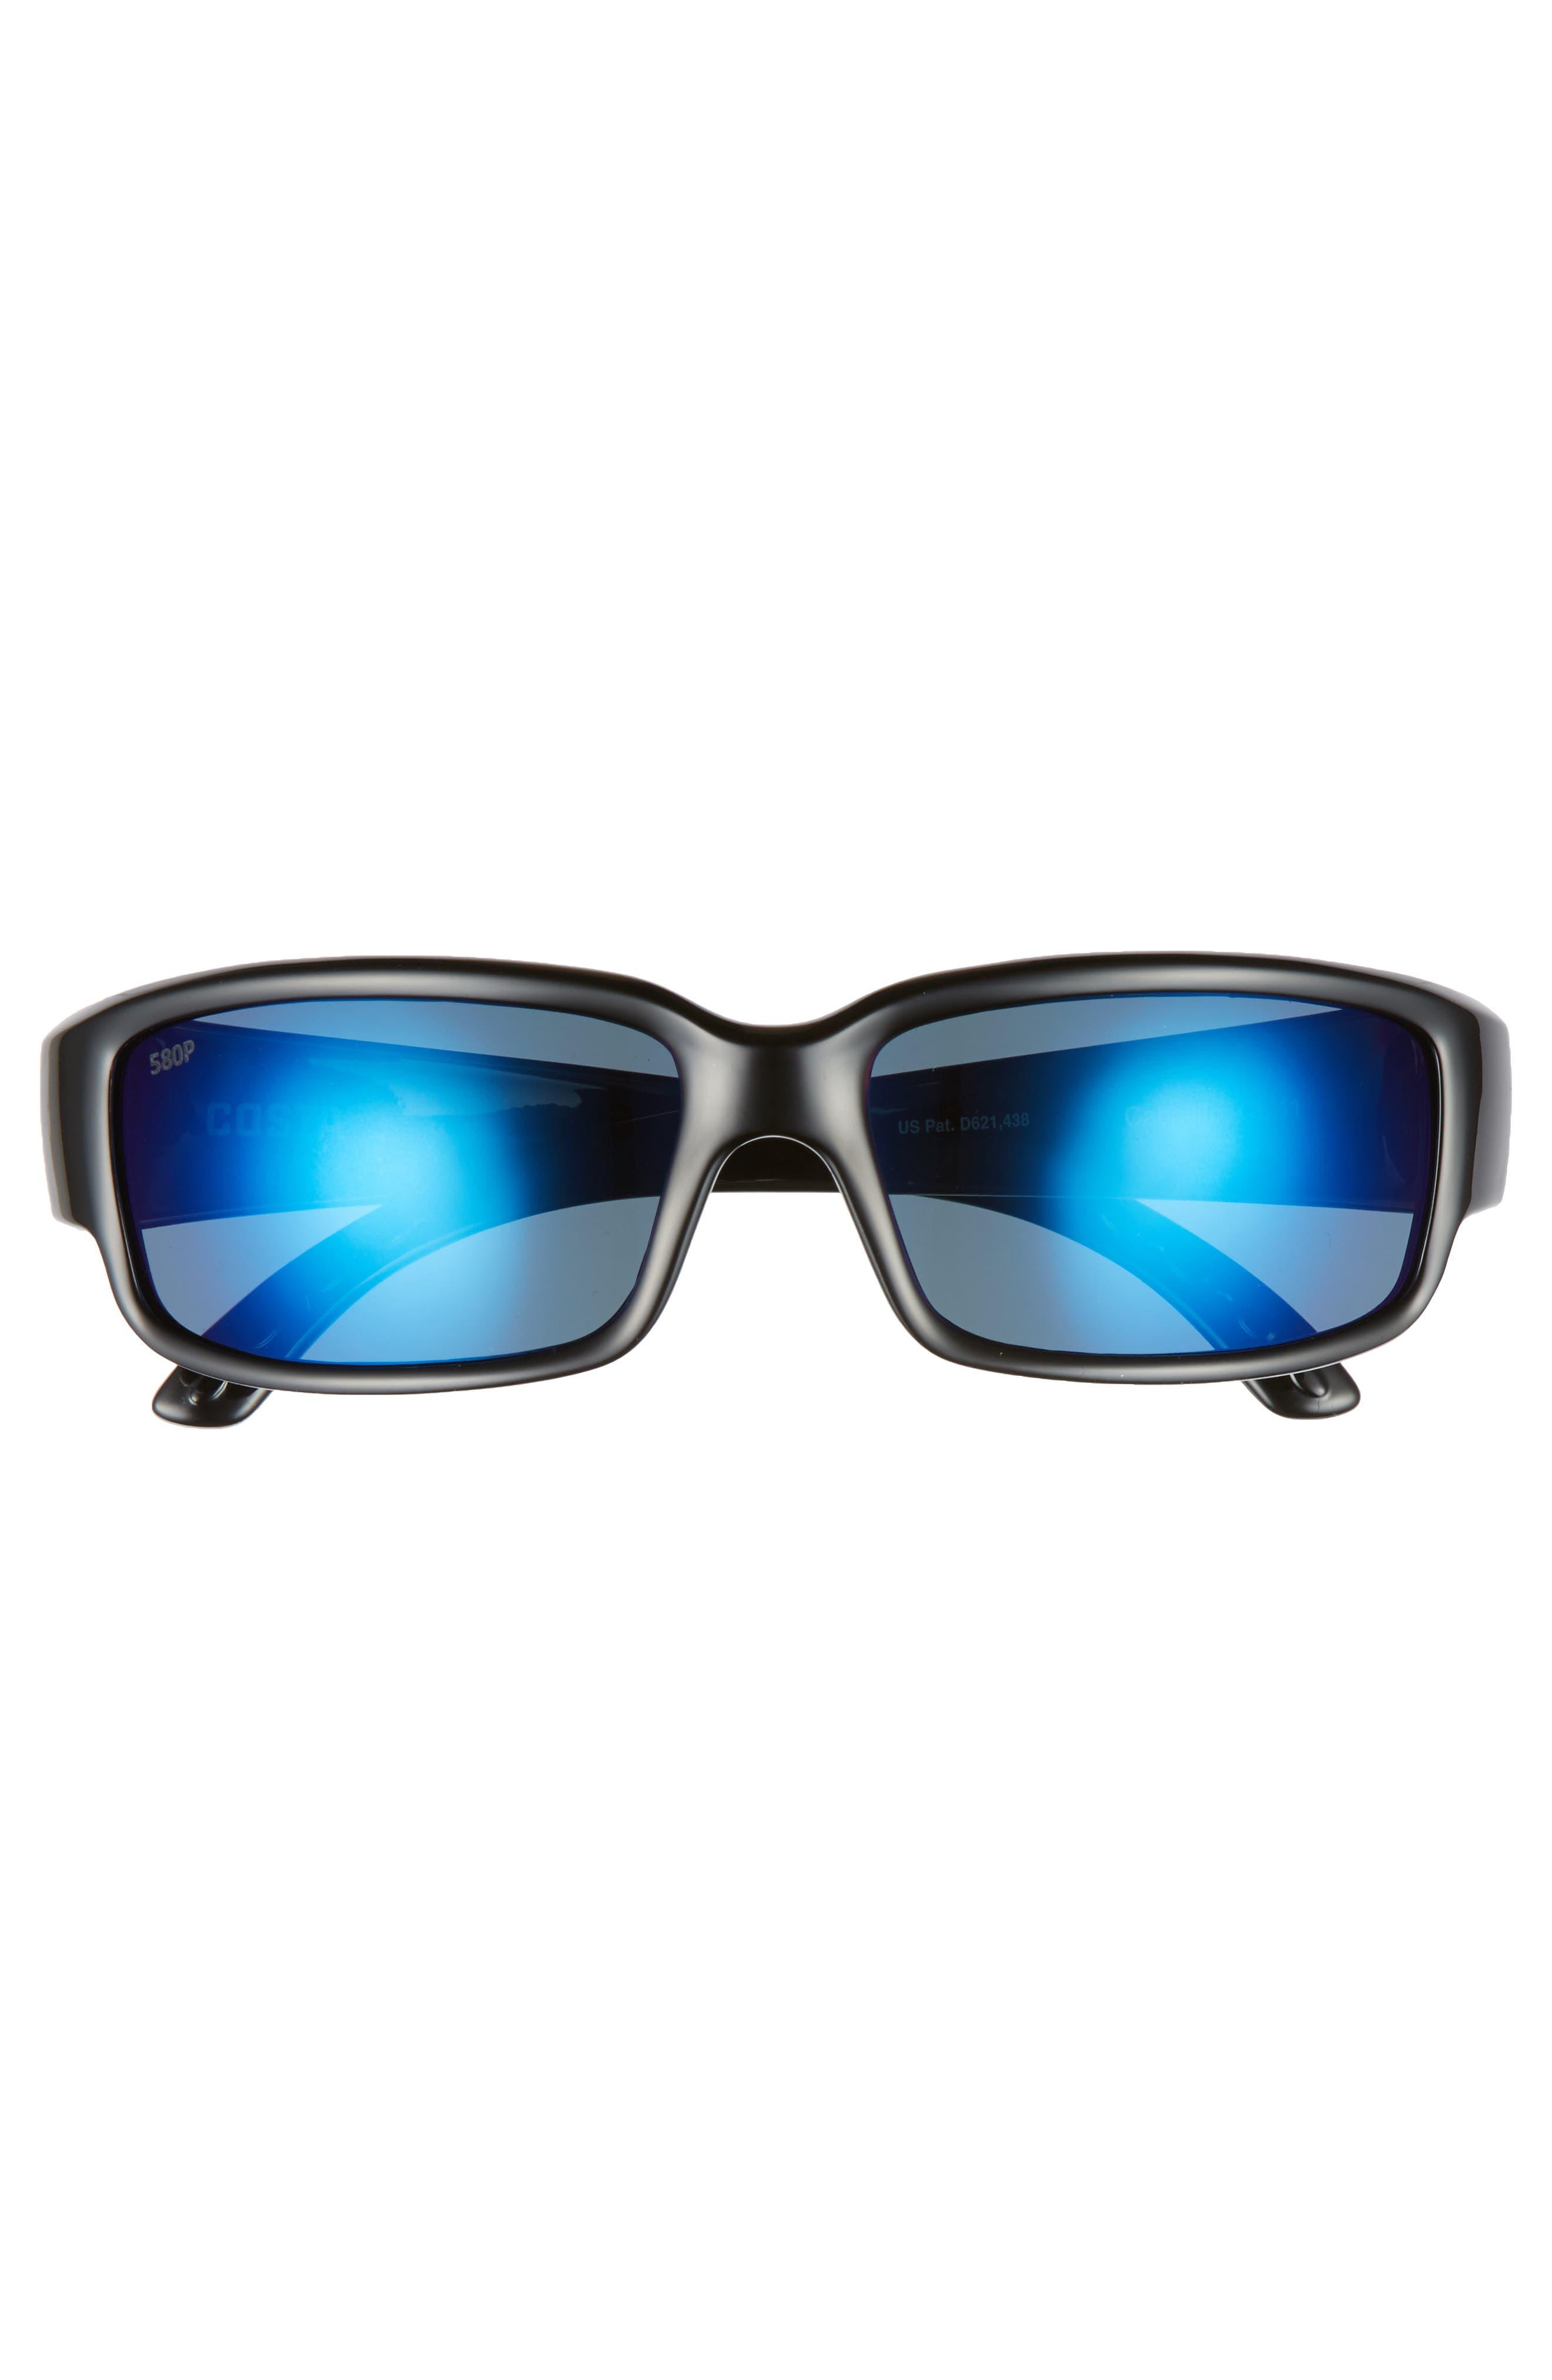 Caballito 60mm Polarized Sunglasses,                             Alternate thumbnail 2, color,                             BLACK/ BLUE MIRROR